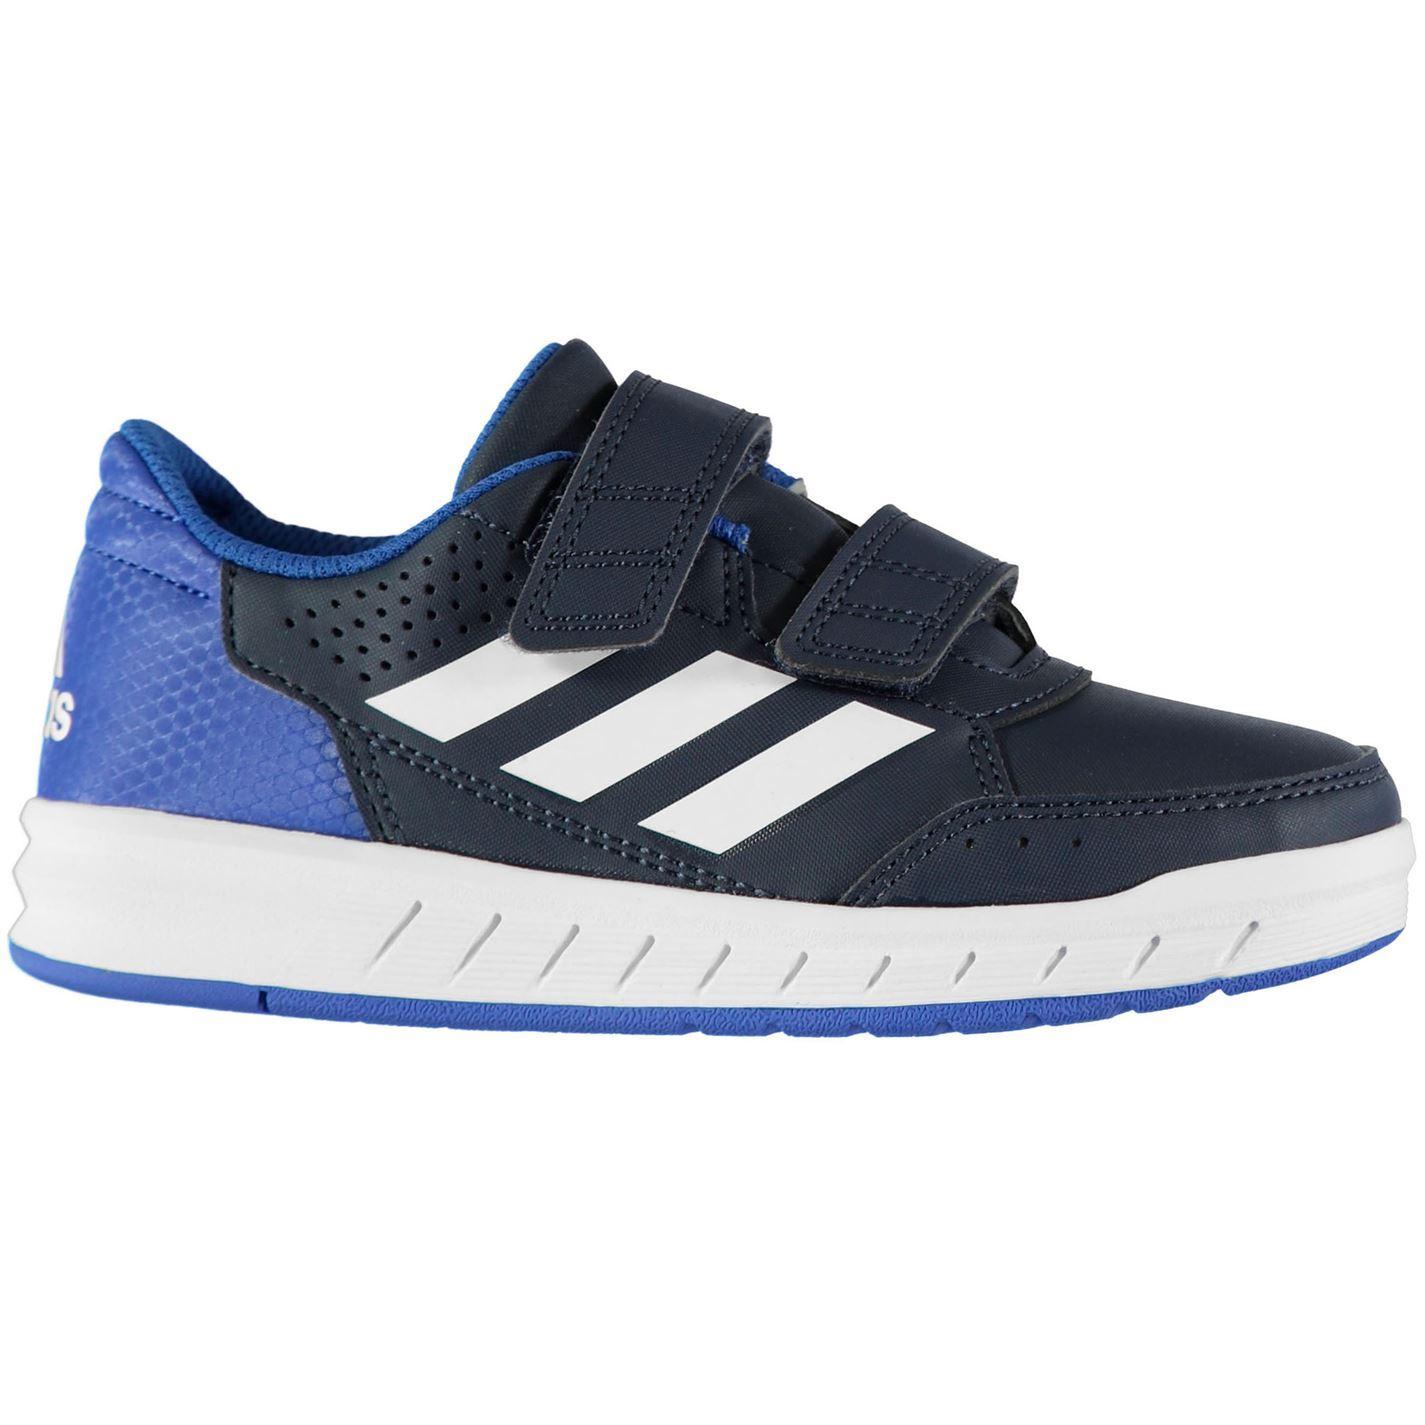 miniatura 12 - ADIDAS-alta-Sport-CF-Scarpe-da-ginnastica-bambino-ragazzo-calzature